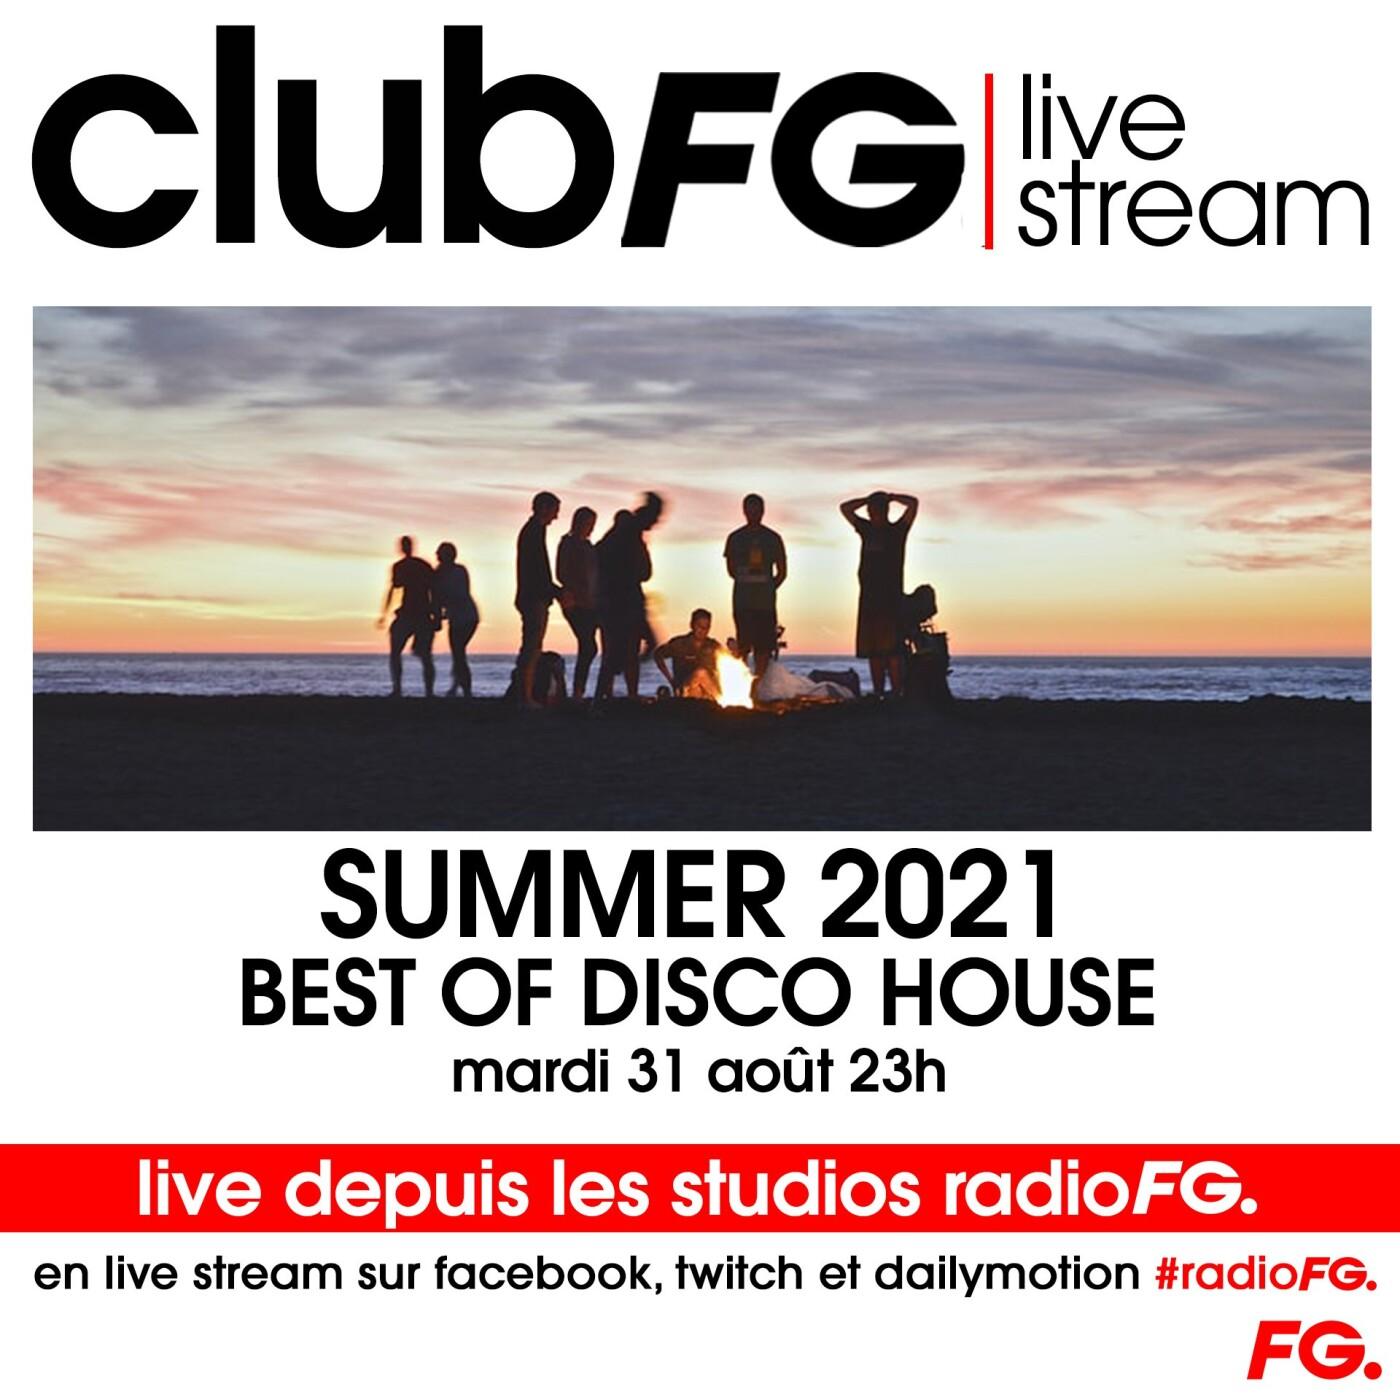 CLUB FG LIVE STREAM : SUMMER 2021 BEST OF DISCO HOUSE